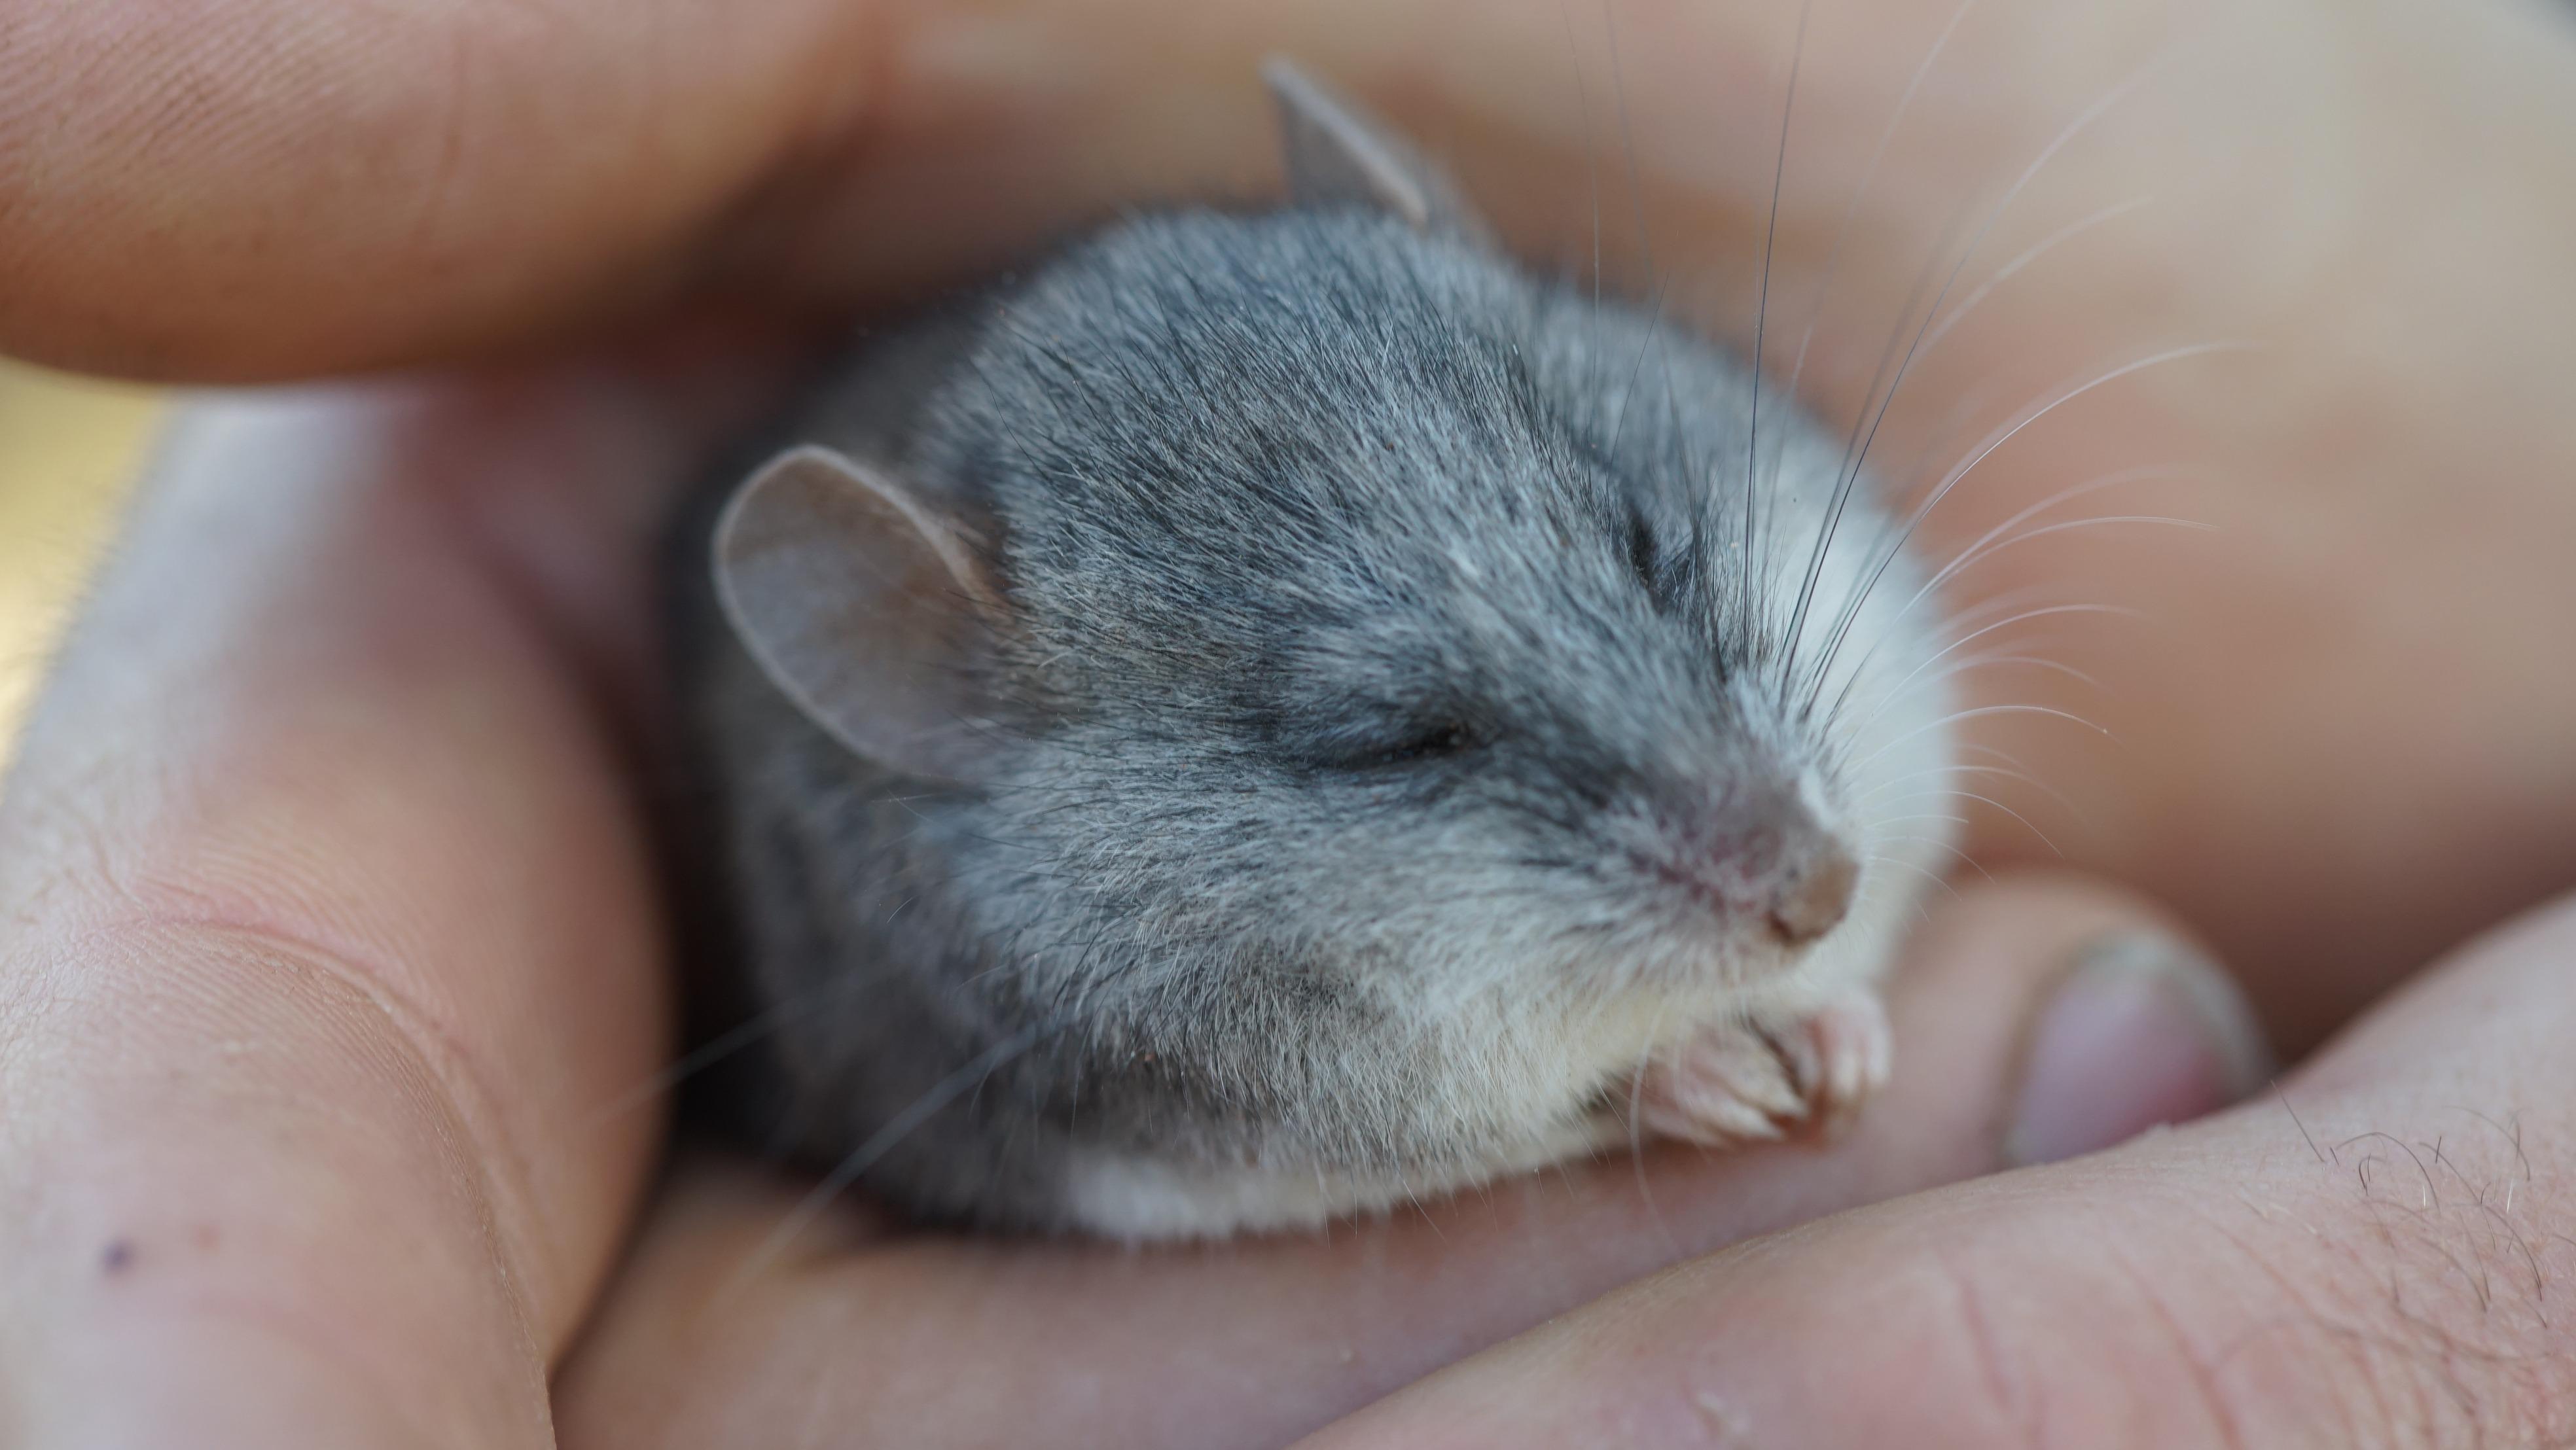 GALLERY: Rewilding Little Desert